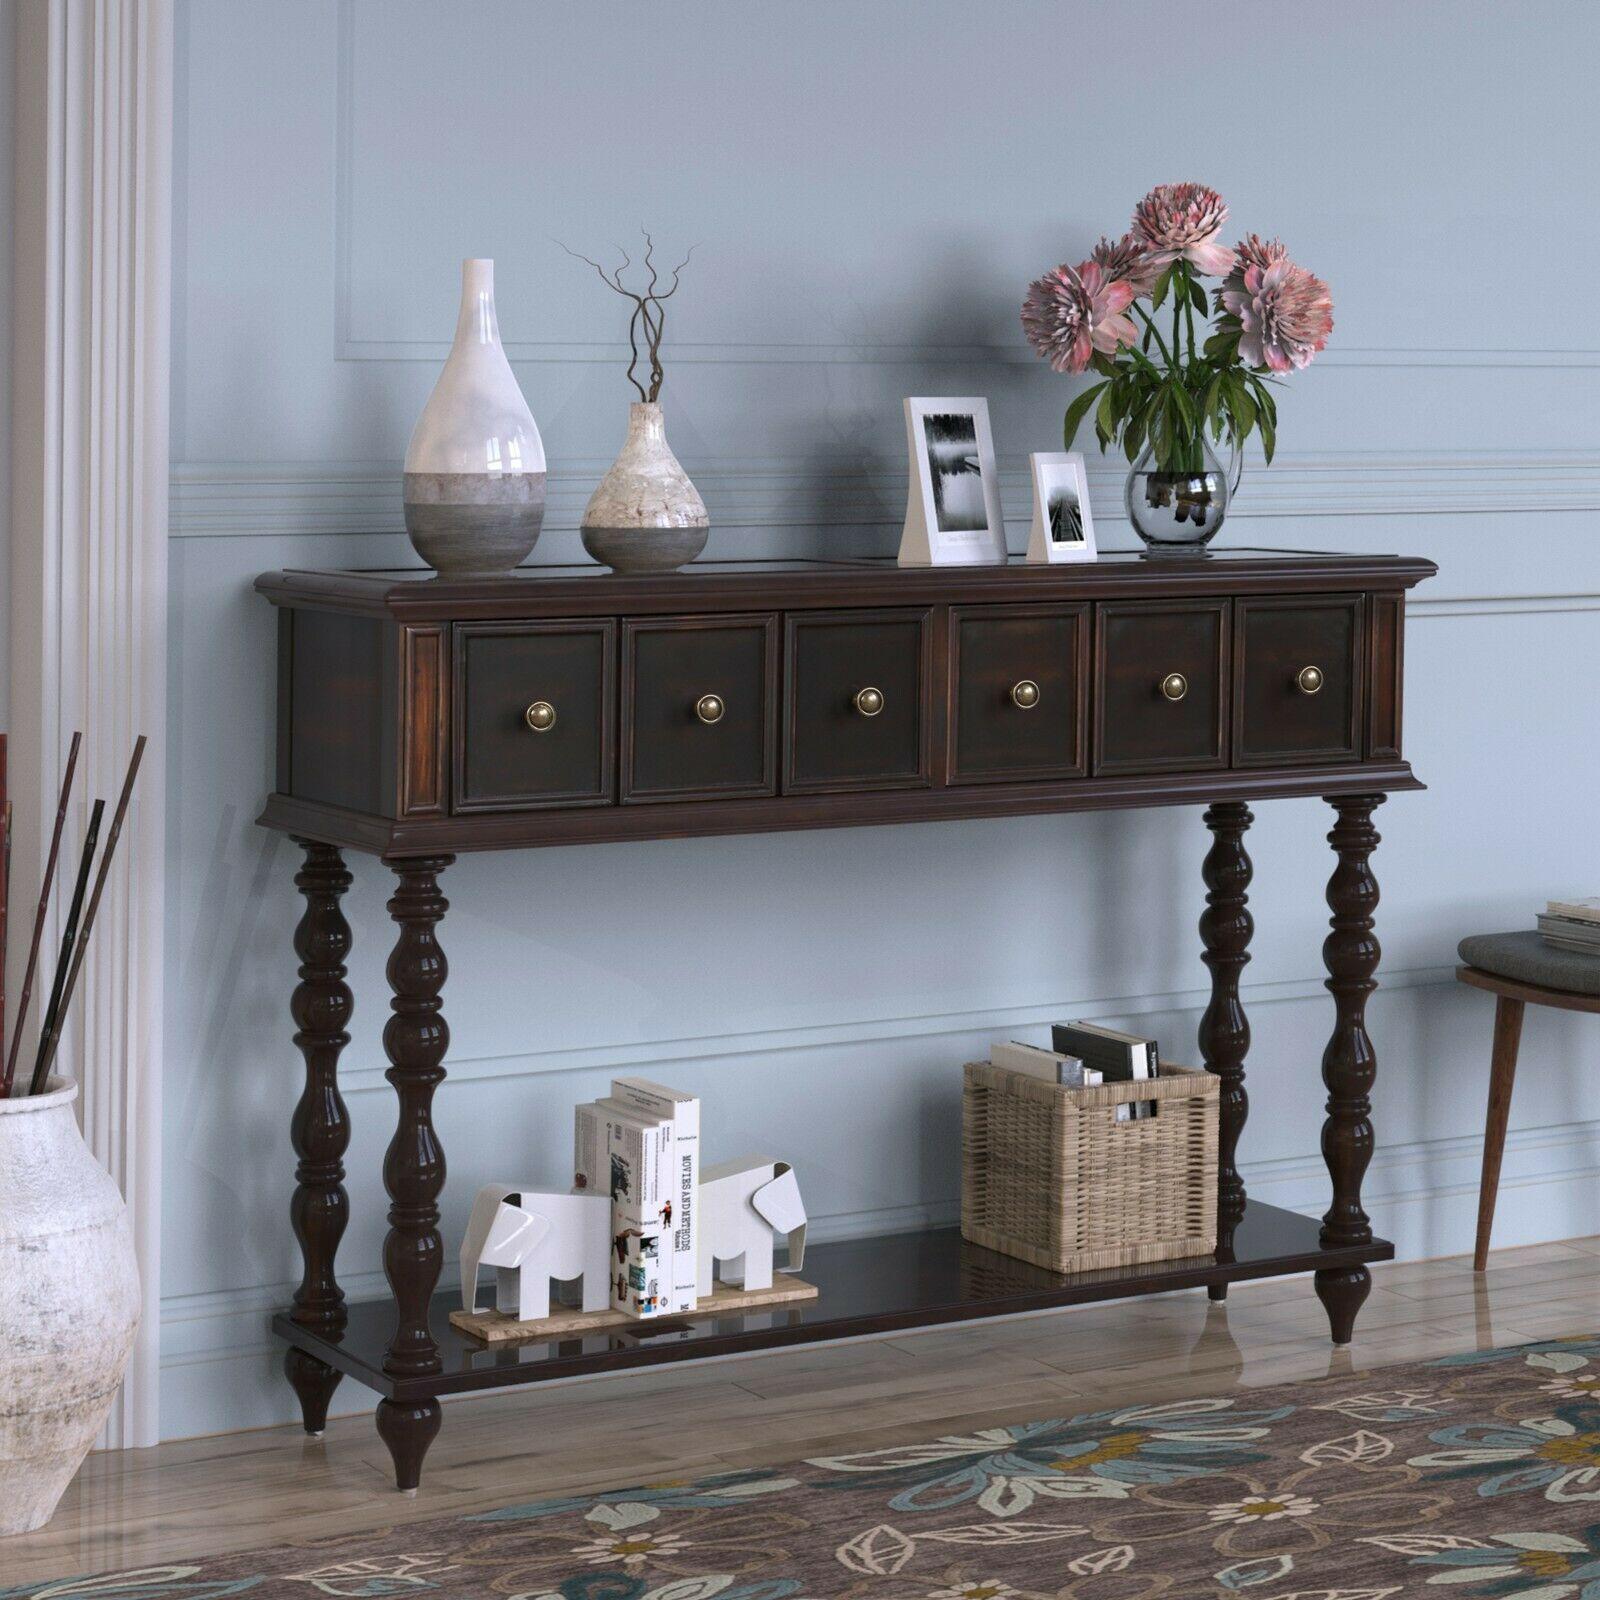 Trexm 6 Drawer Console Table Shelf Hallway Side End Dressing Desk Black Sofa Table Ideas Of Sofa T In 2020 Rustic Console Tables Rustic Consoles Wood Console Table